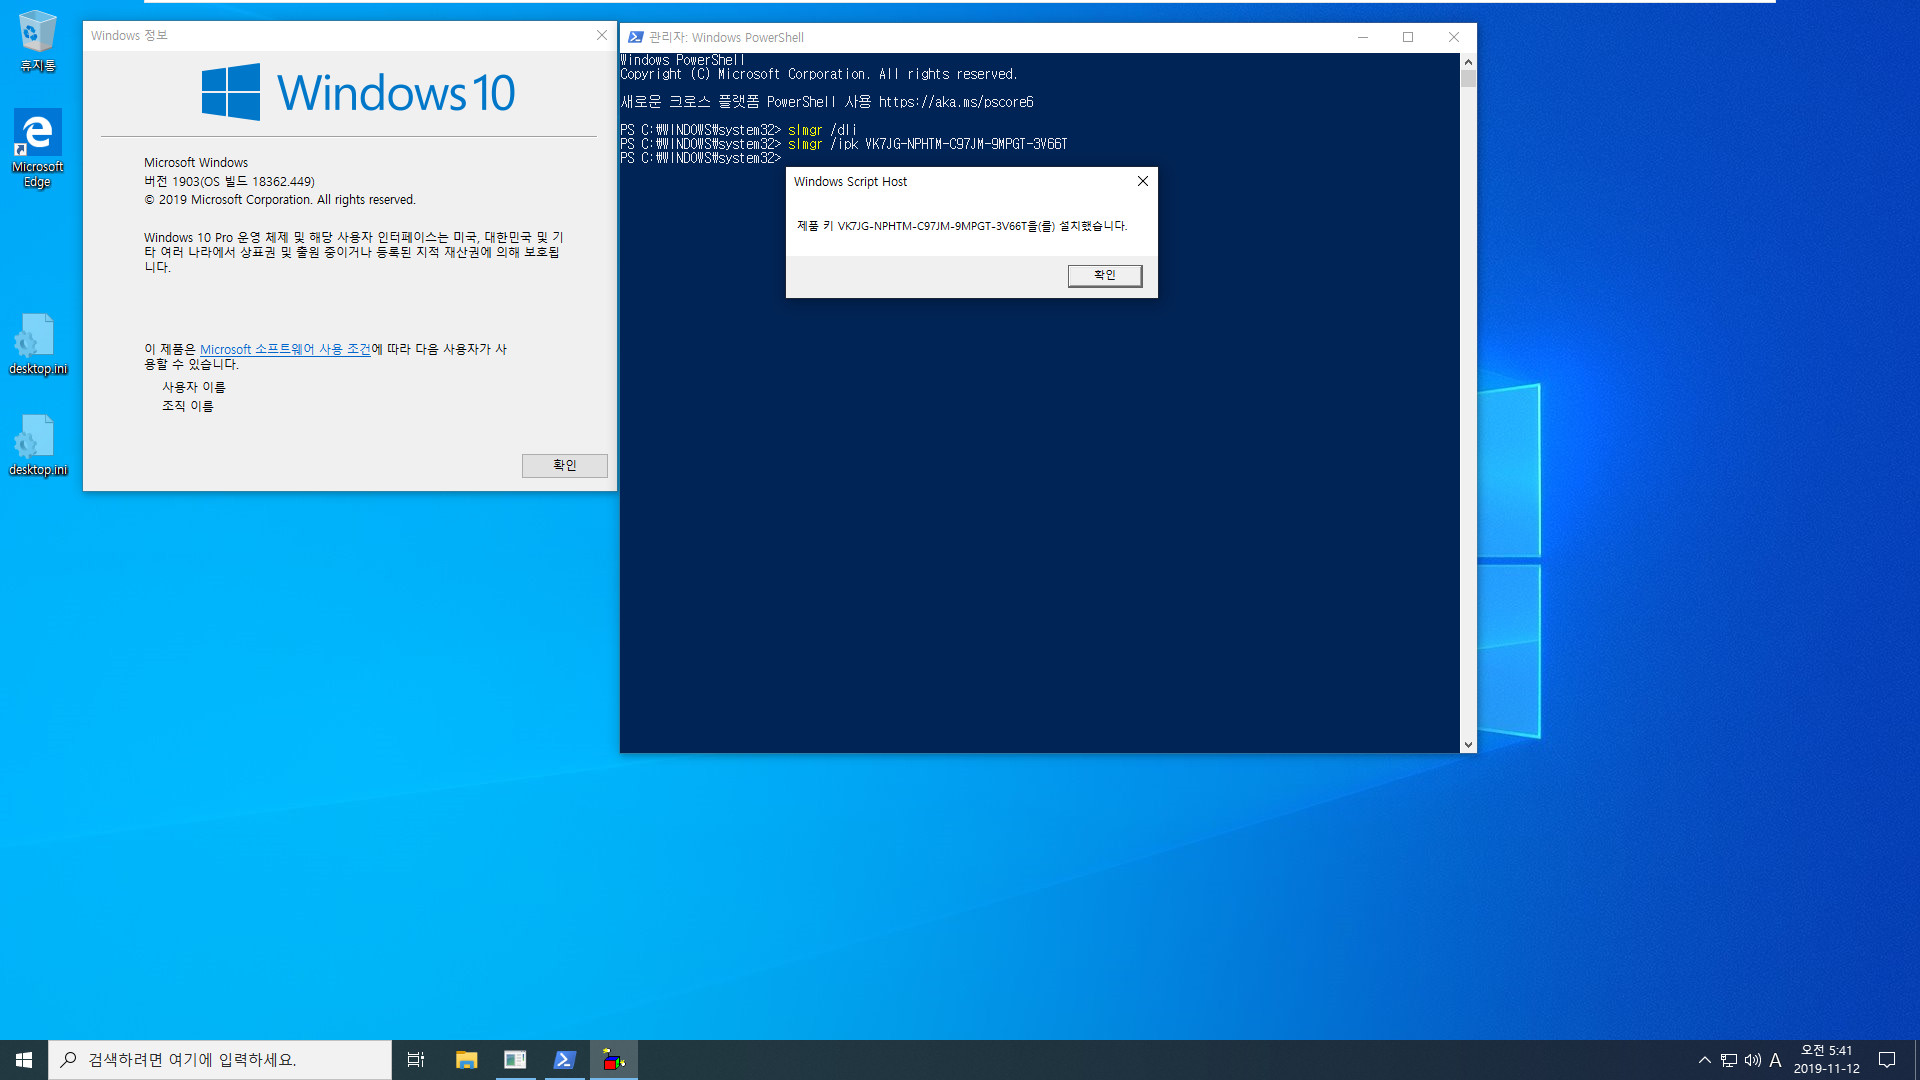 Windows 10 Enterprise LTSC [2019] (버전 1809) 를 버전 1903 프로로 업그레이드 설치하기 - 우선 설정과 앱 유지를 위해서 버전 1903 Enterprise로 업그레이드 한 후에 버전 1903 Pro로 변경하면 됩니다 2019-11-12_054159.jpg